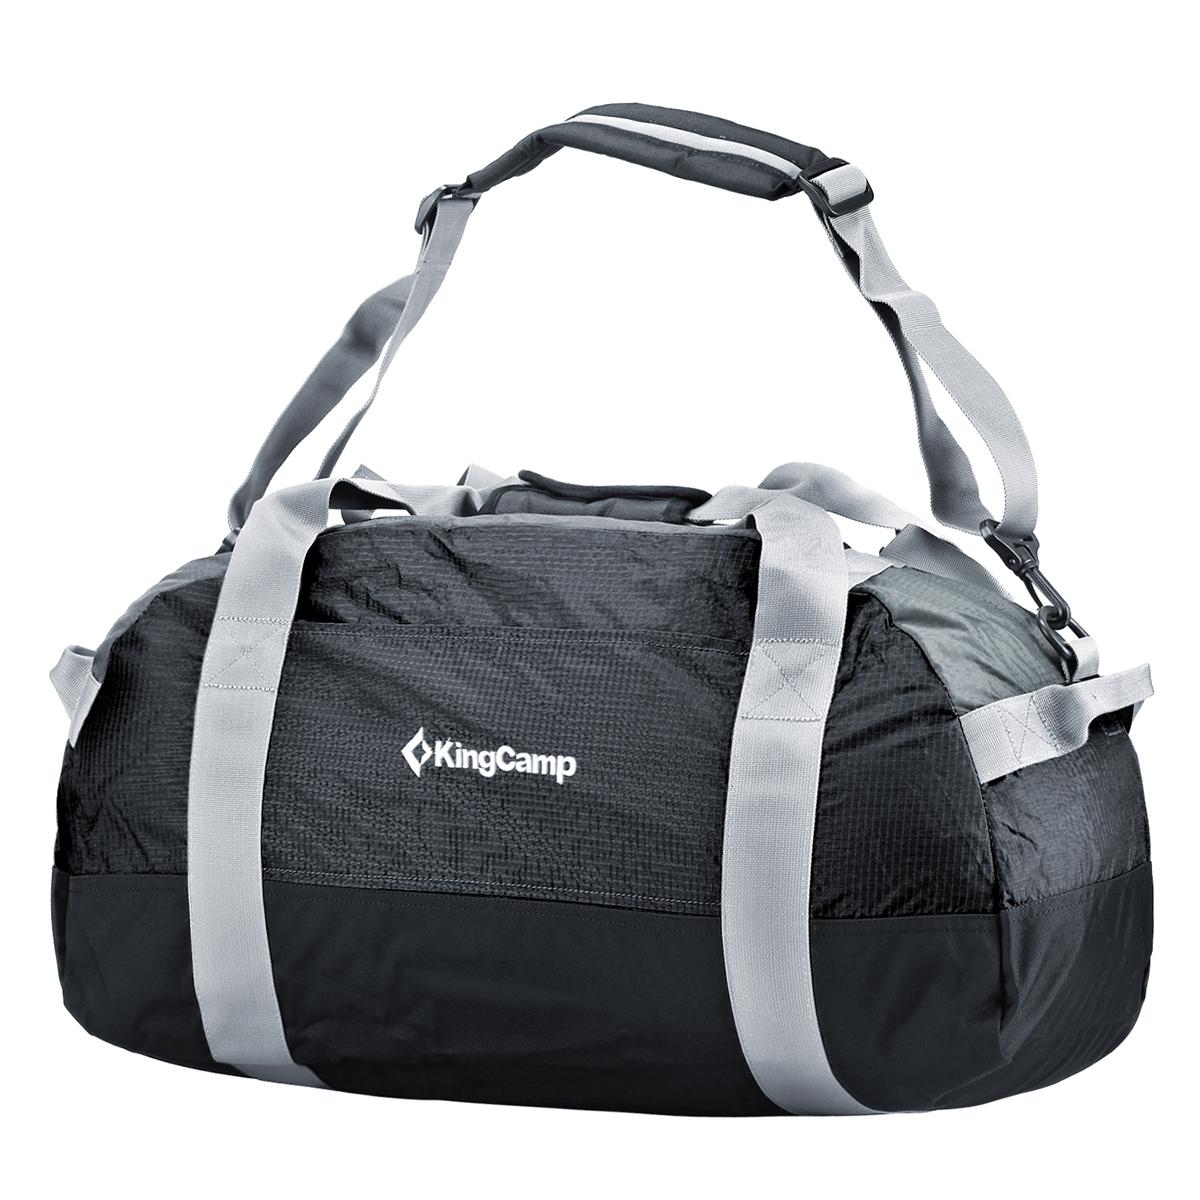 Сумка-баул для путешествий AIRPORTER, цвет: черный. 90 лУТ-000058054АIRPORTER 90 сумка-баул для путешествий, шопинга в чехле Артикул KB4307 Объем: 90 литров Размеры: 76 х 38 х 36 см Упаковка: 28 х 16 х 8 см Материал: нейлон 210D Double RipStop PU from Korea, полиэстер